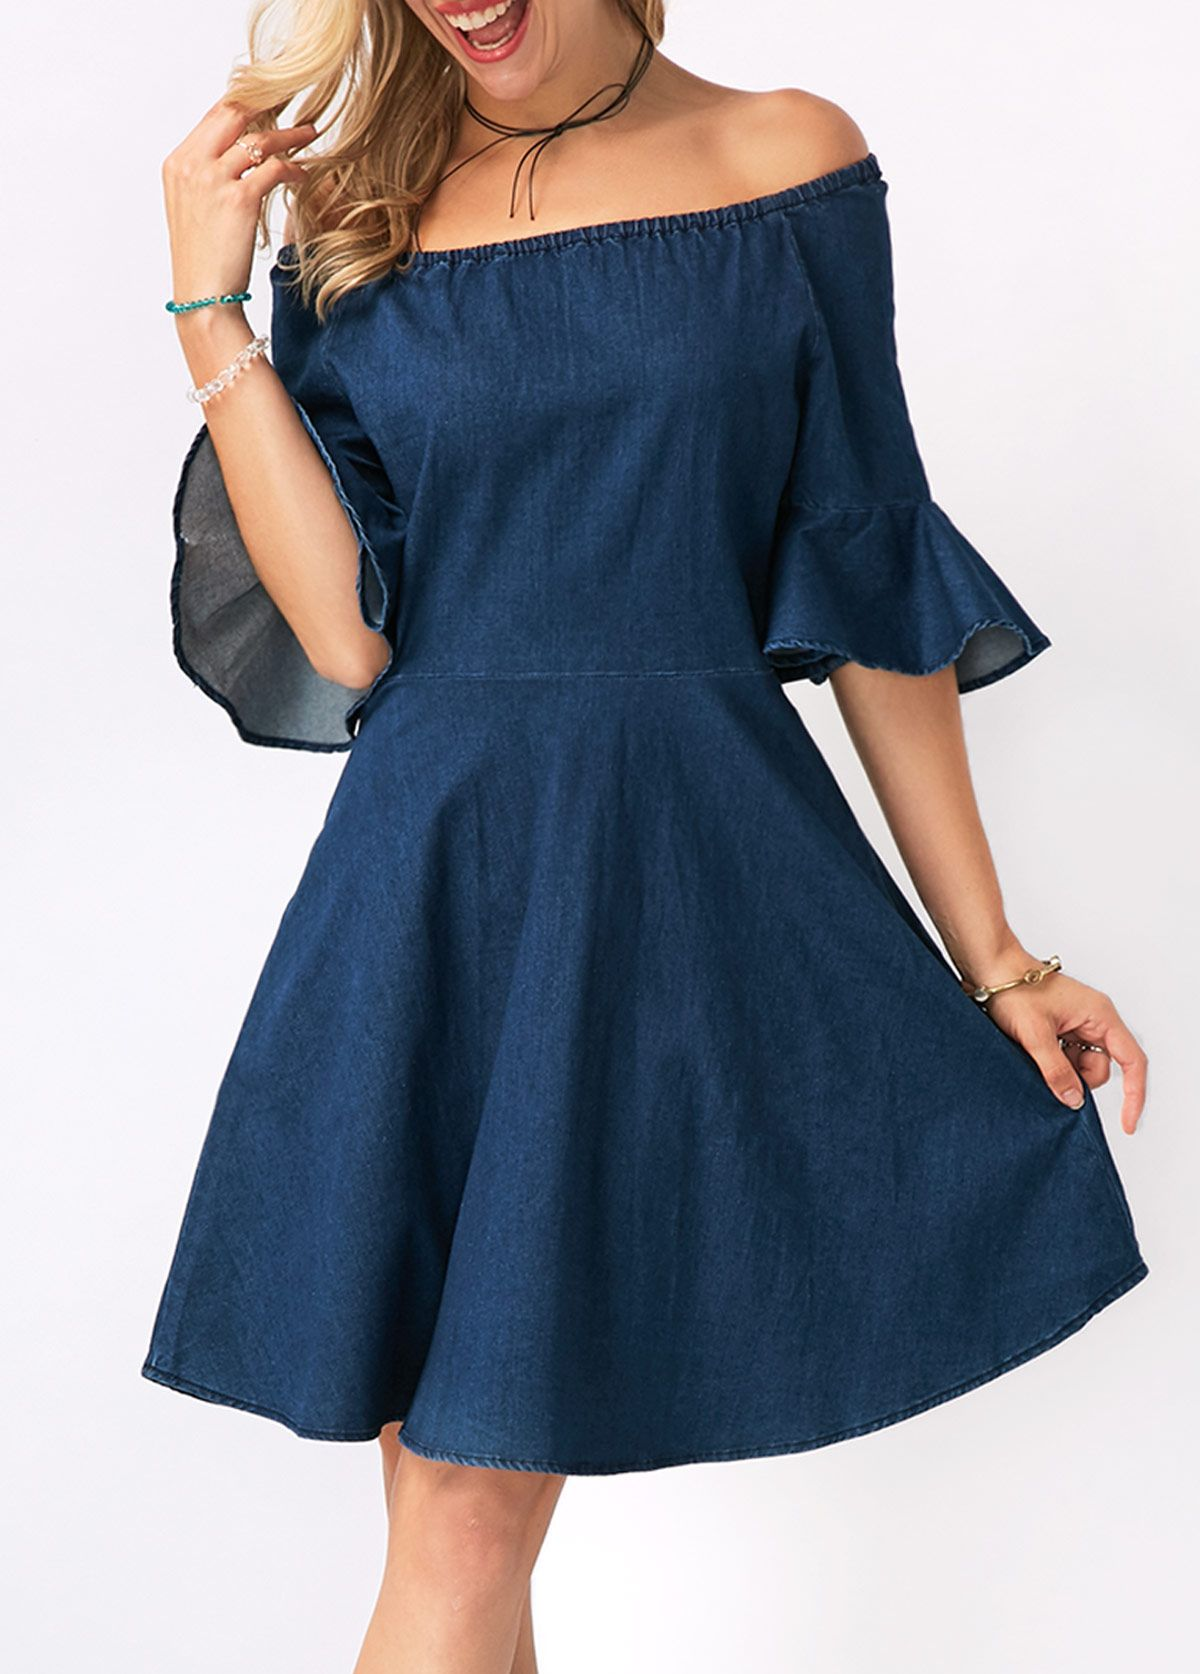 Flare Cuff Off the Shoulder Denim Blue Dress